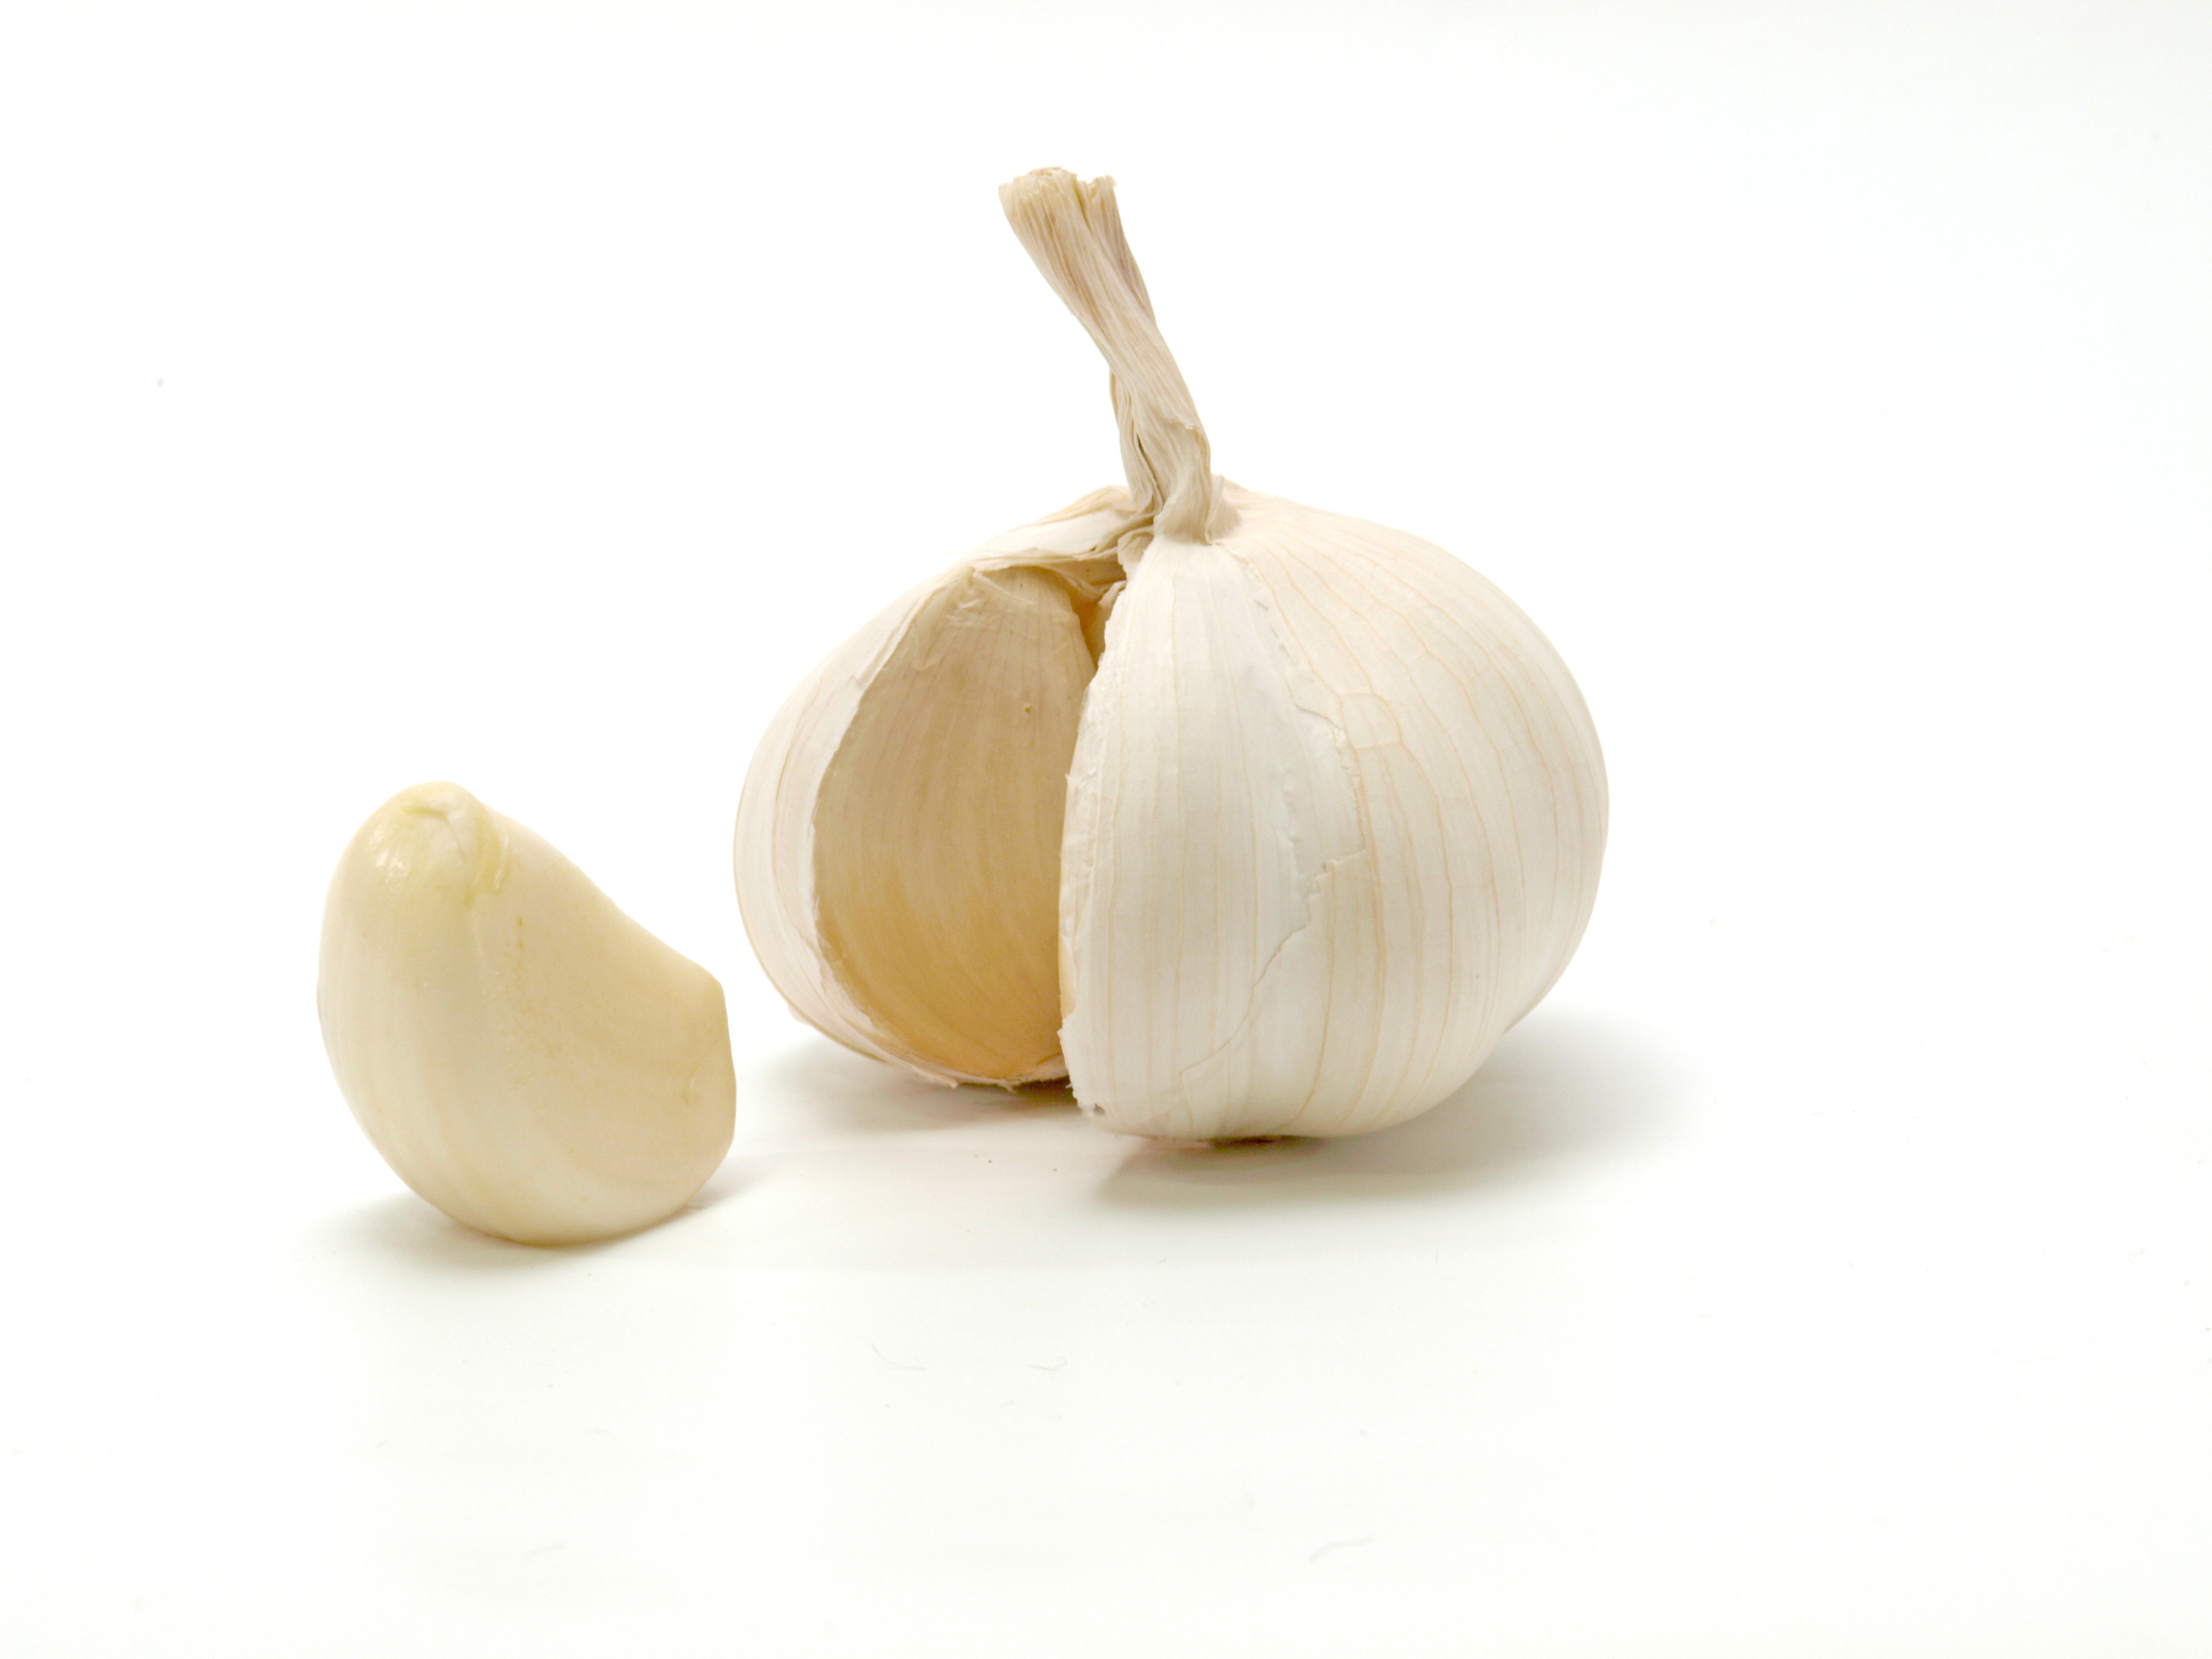 Opened garlic bulb with garlic clove jpg